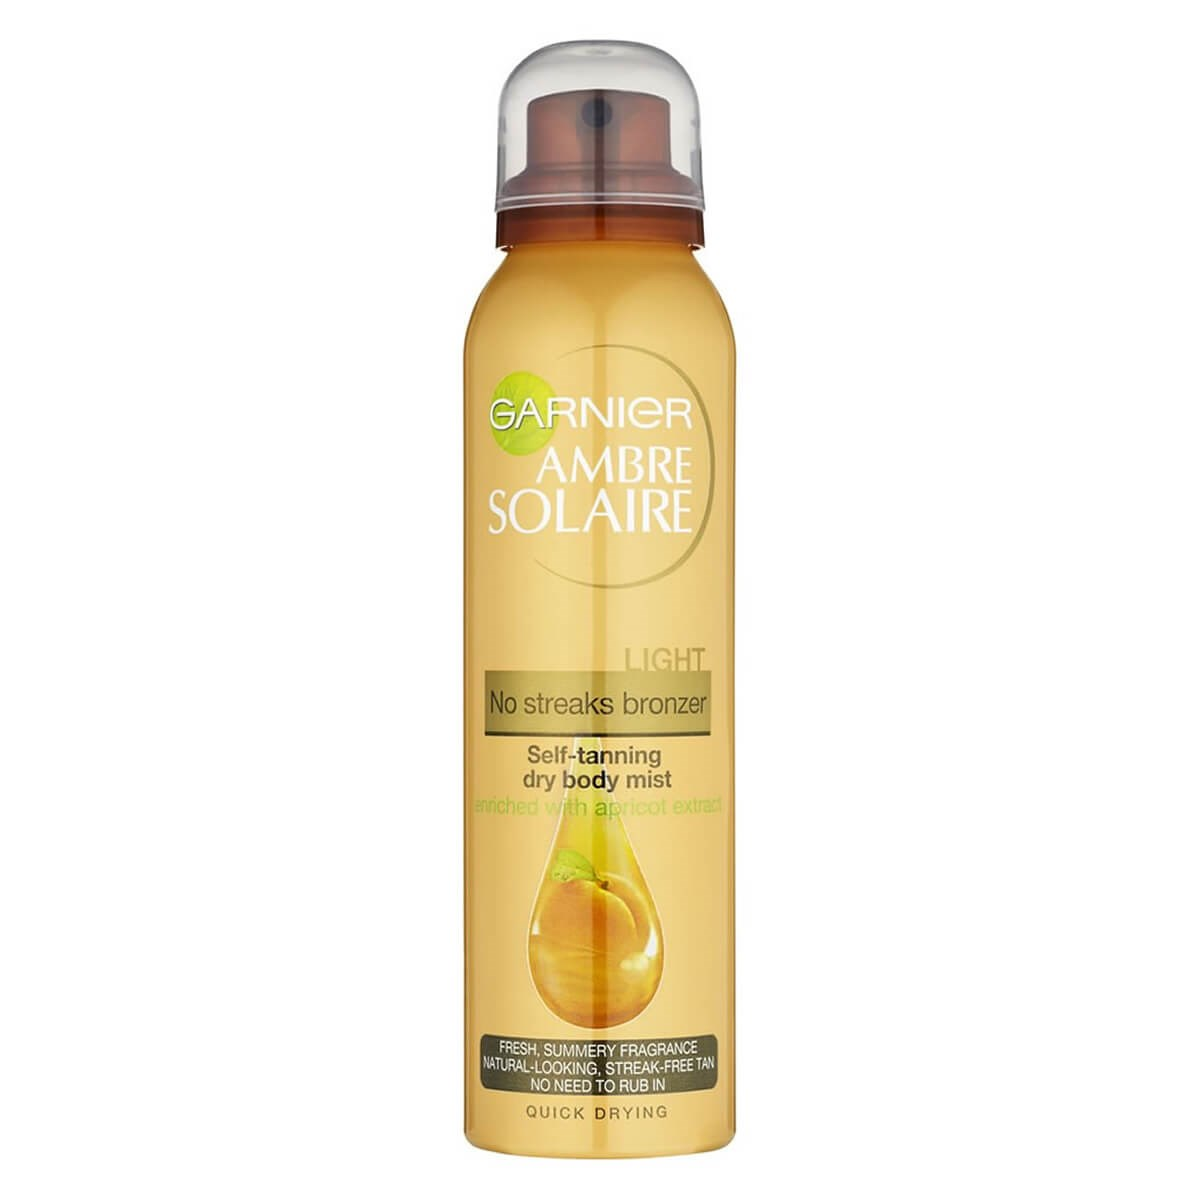 Garnier Ambre Solaire No-Streaks Bronzer Dry Body Mist (Light)